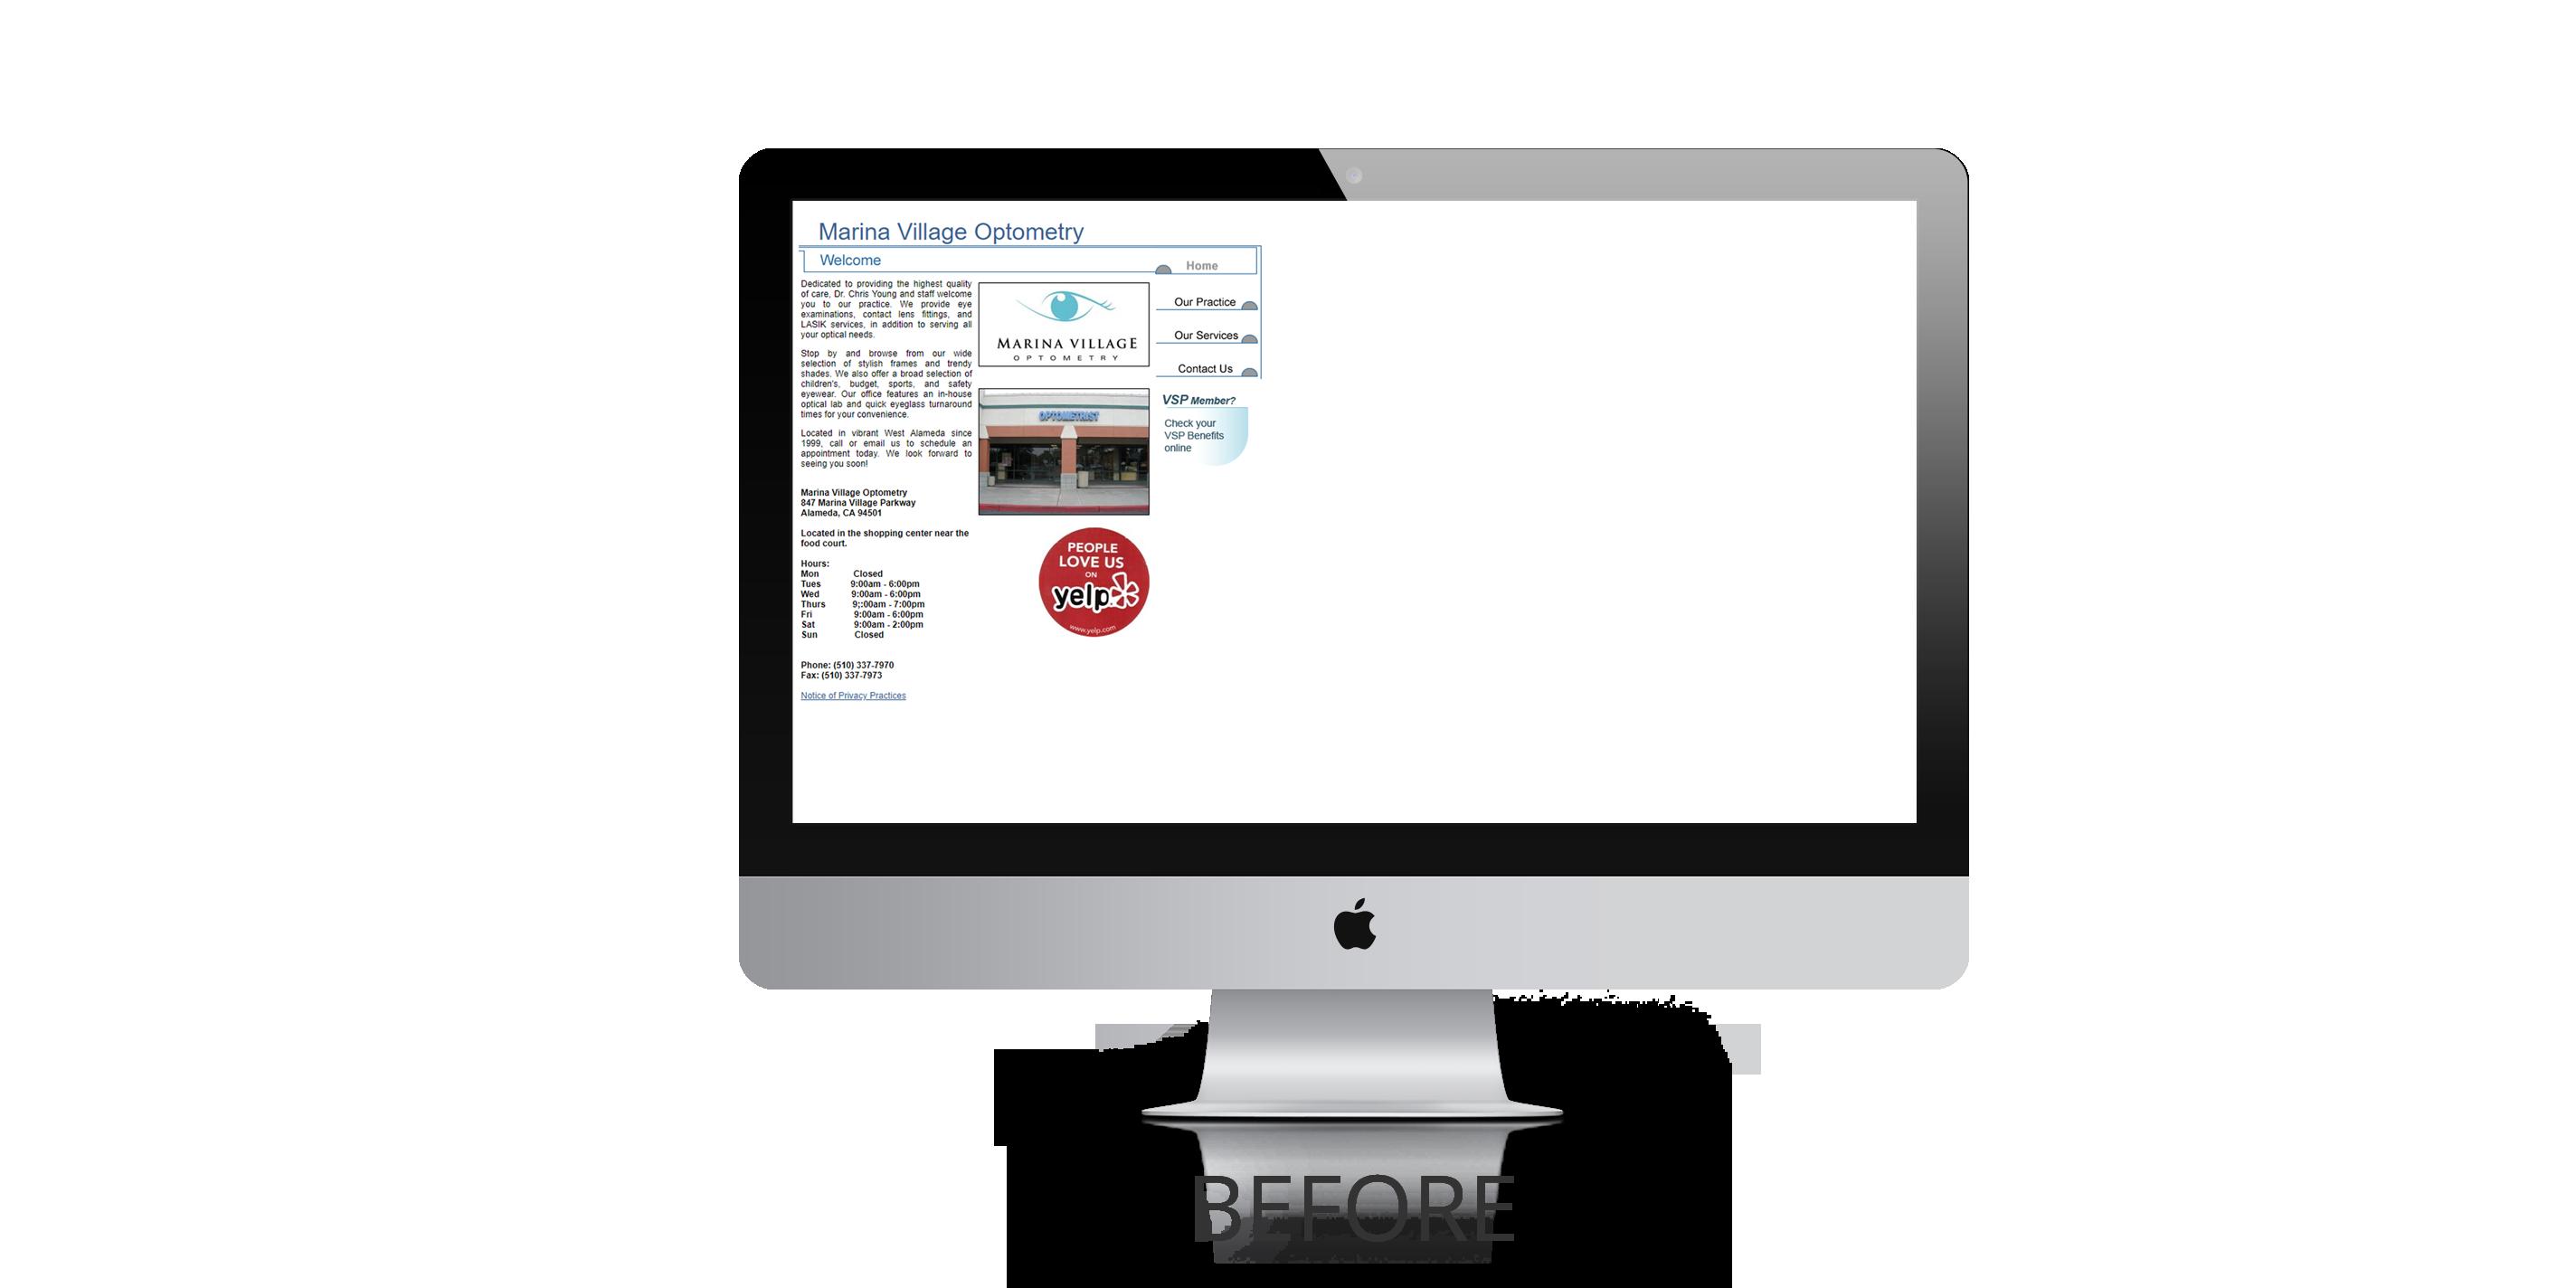 Marina Village Optometry Website Design Before